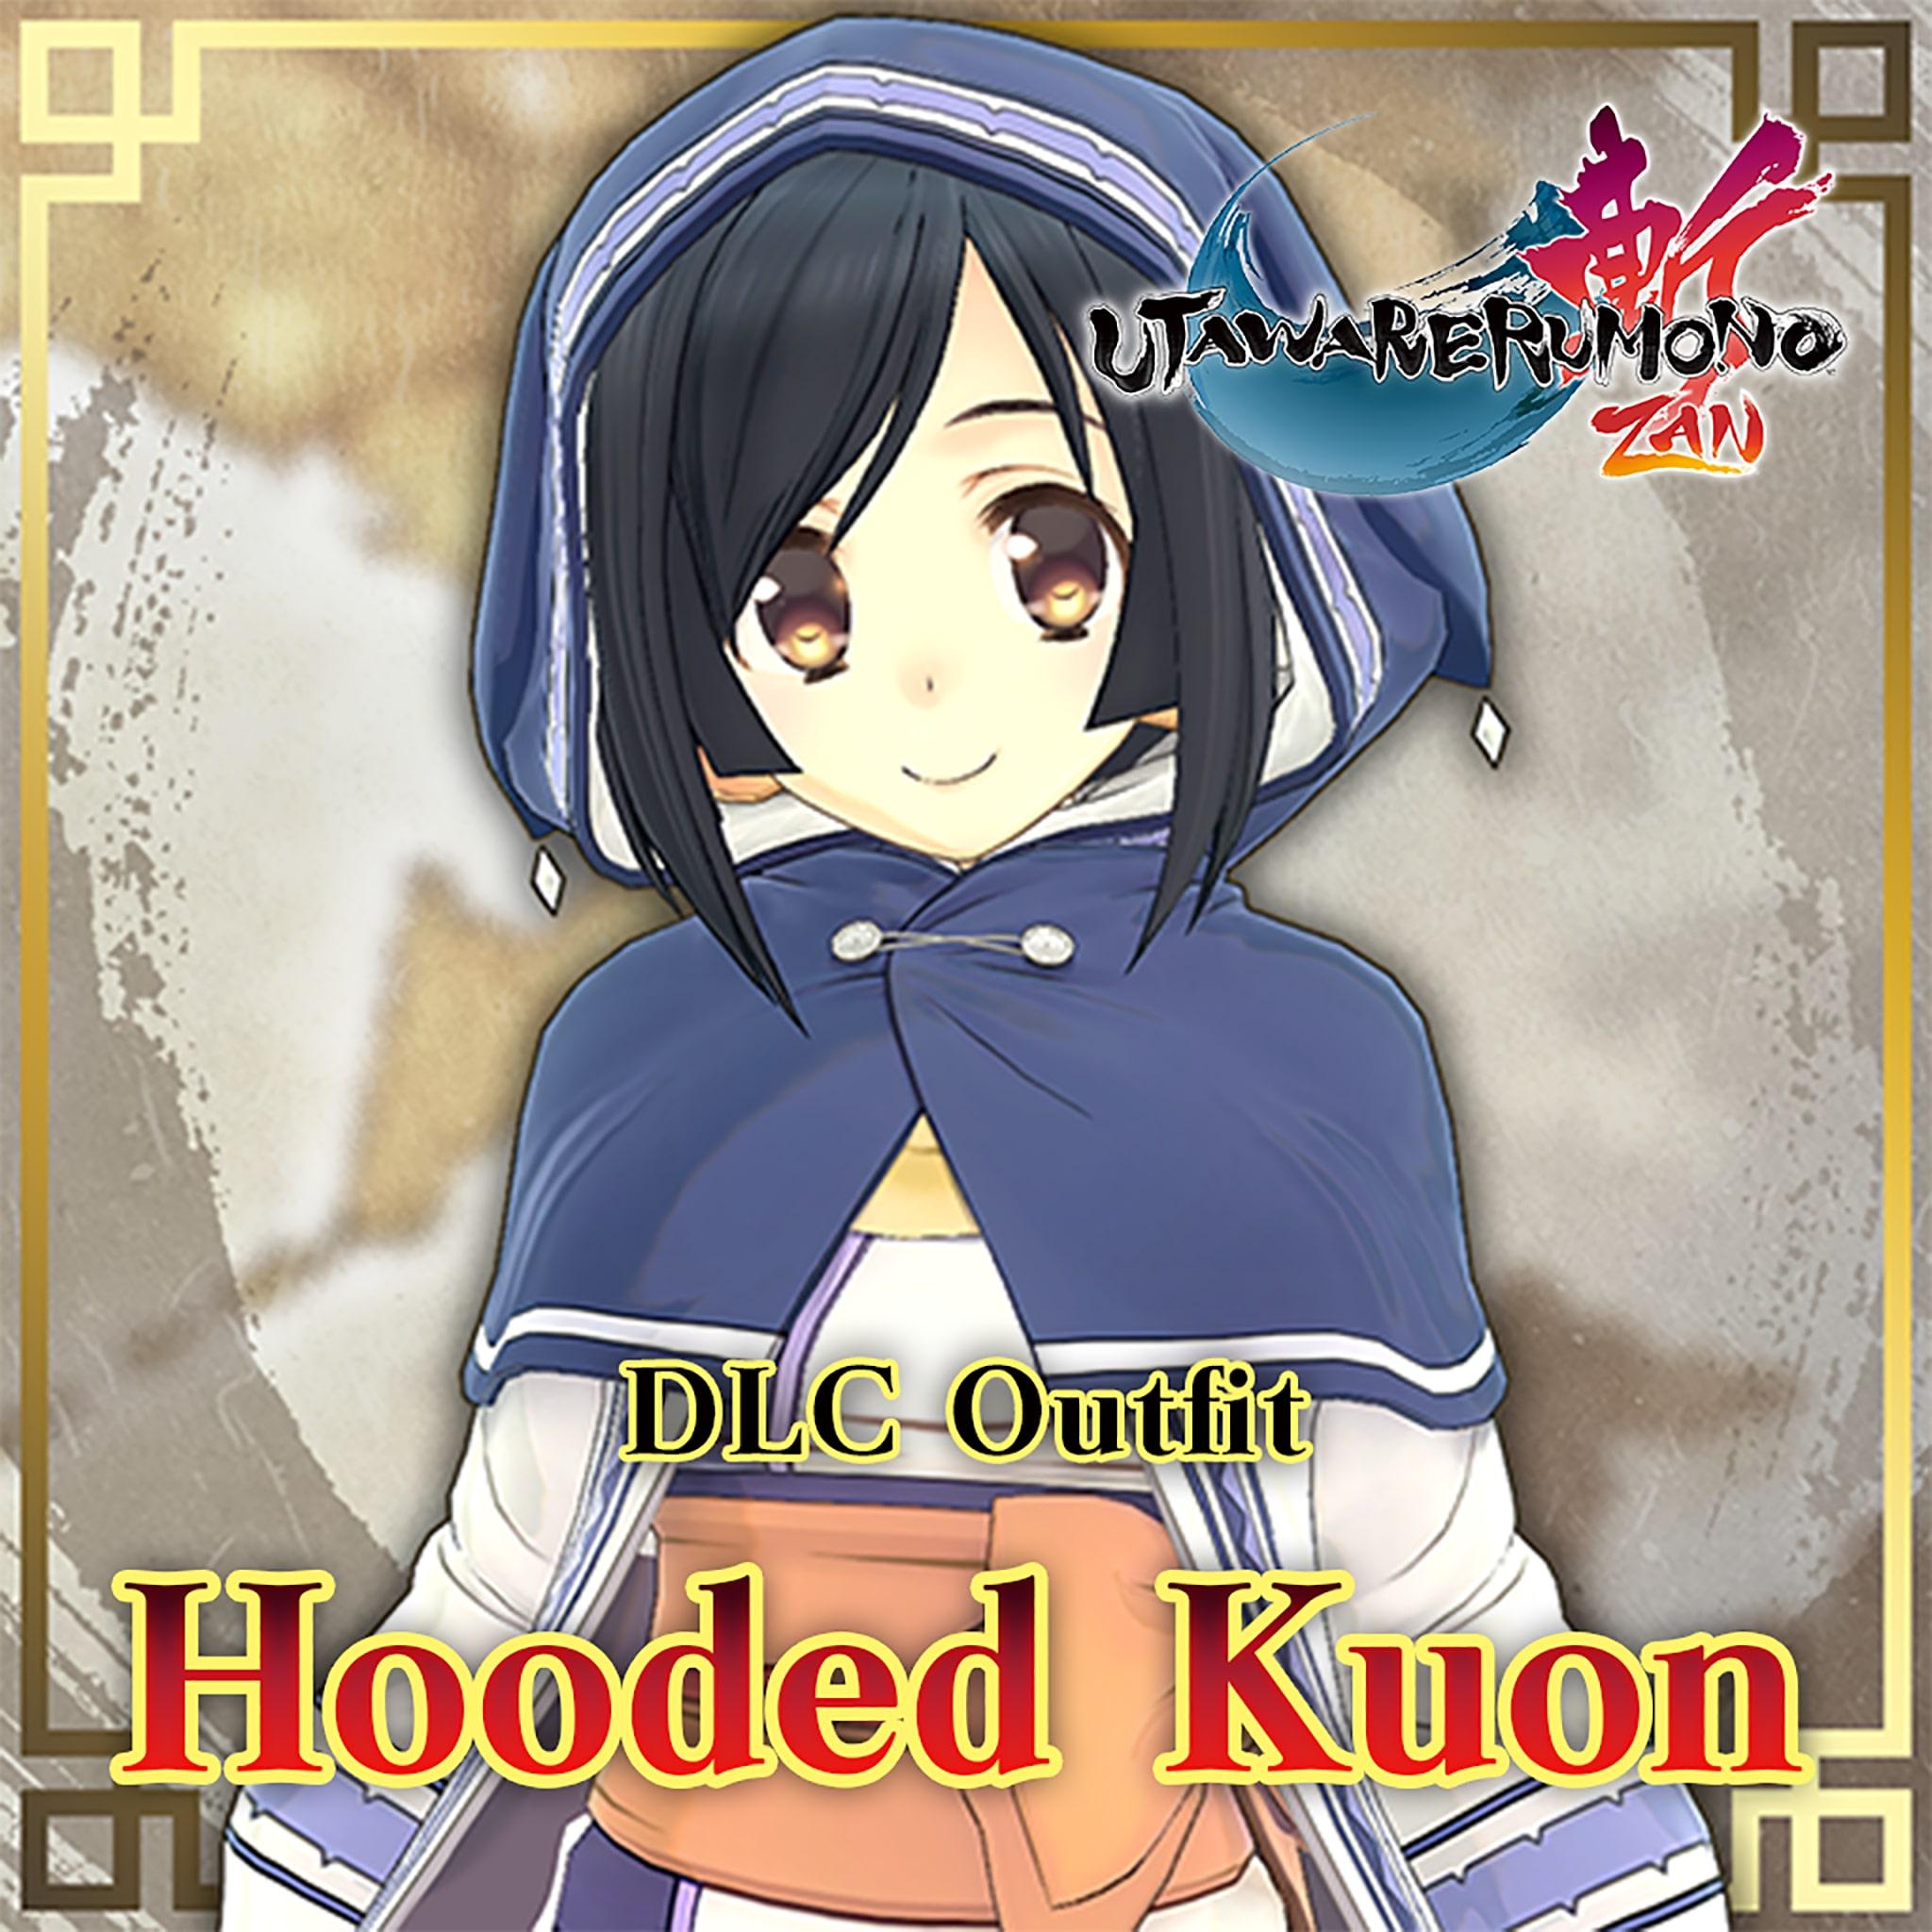 Utawarerumono: ZAN Special Outfit - Hooded Kuon